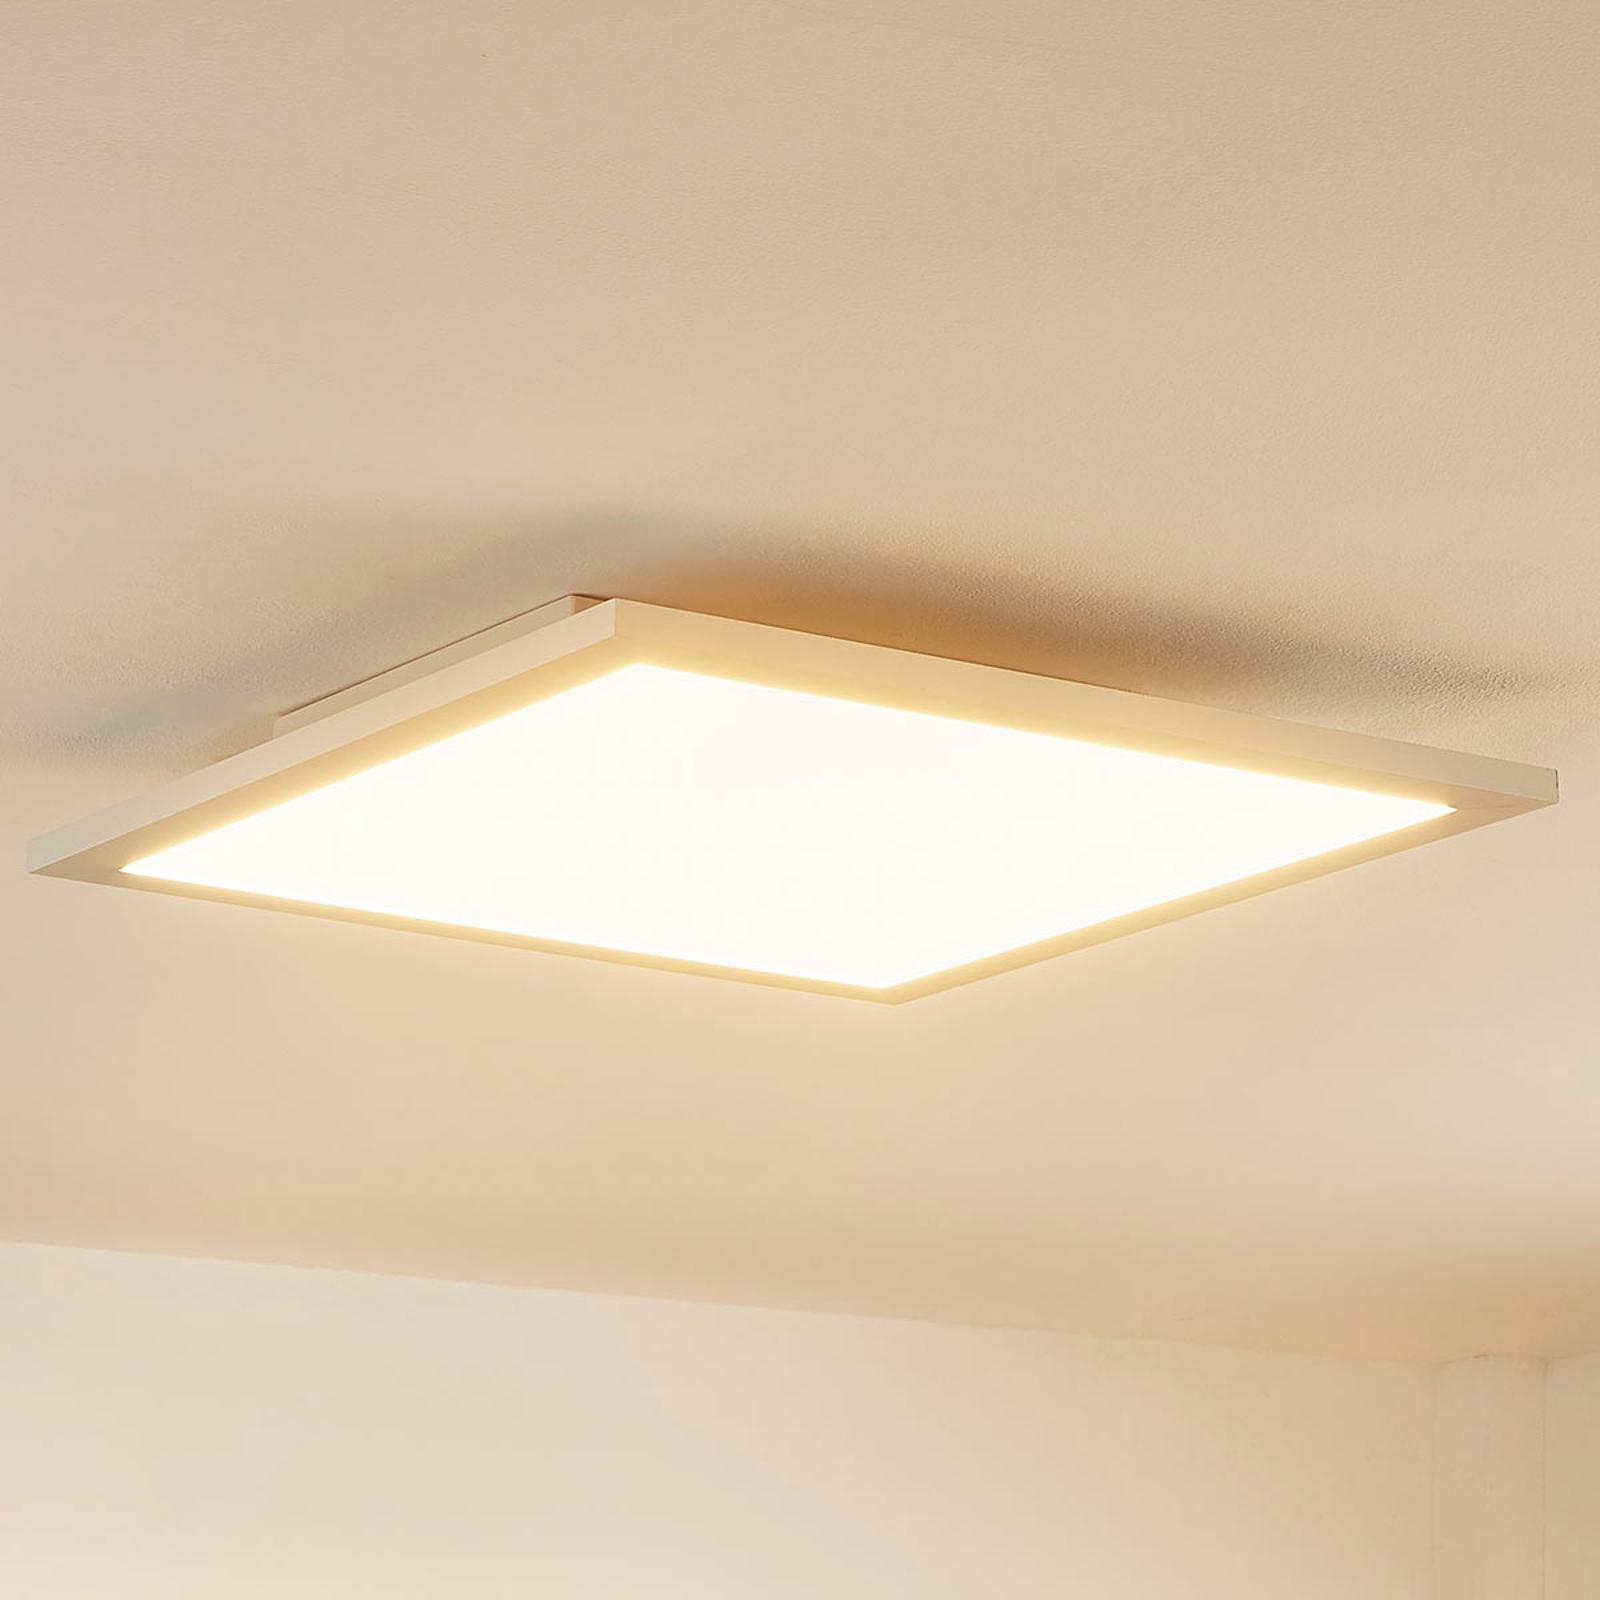 LED-Deckenaufbau-Panel Enja, quadratisch